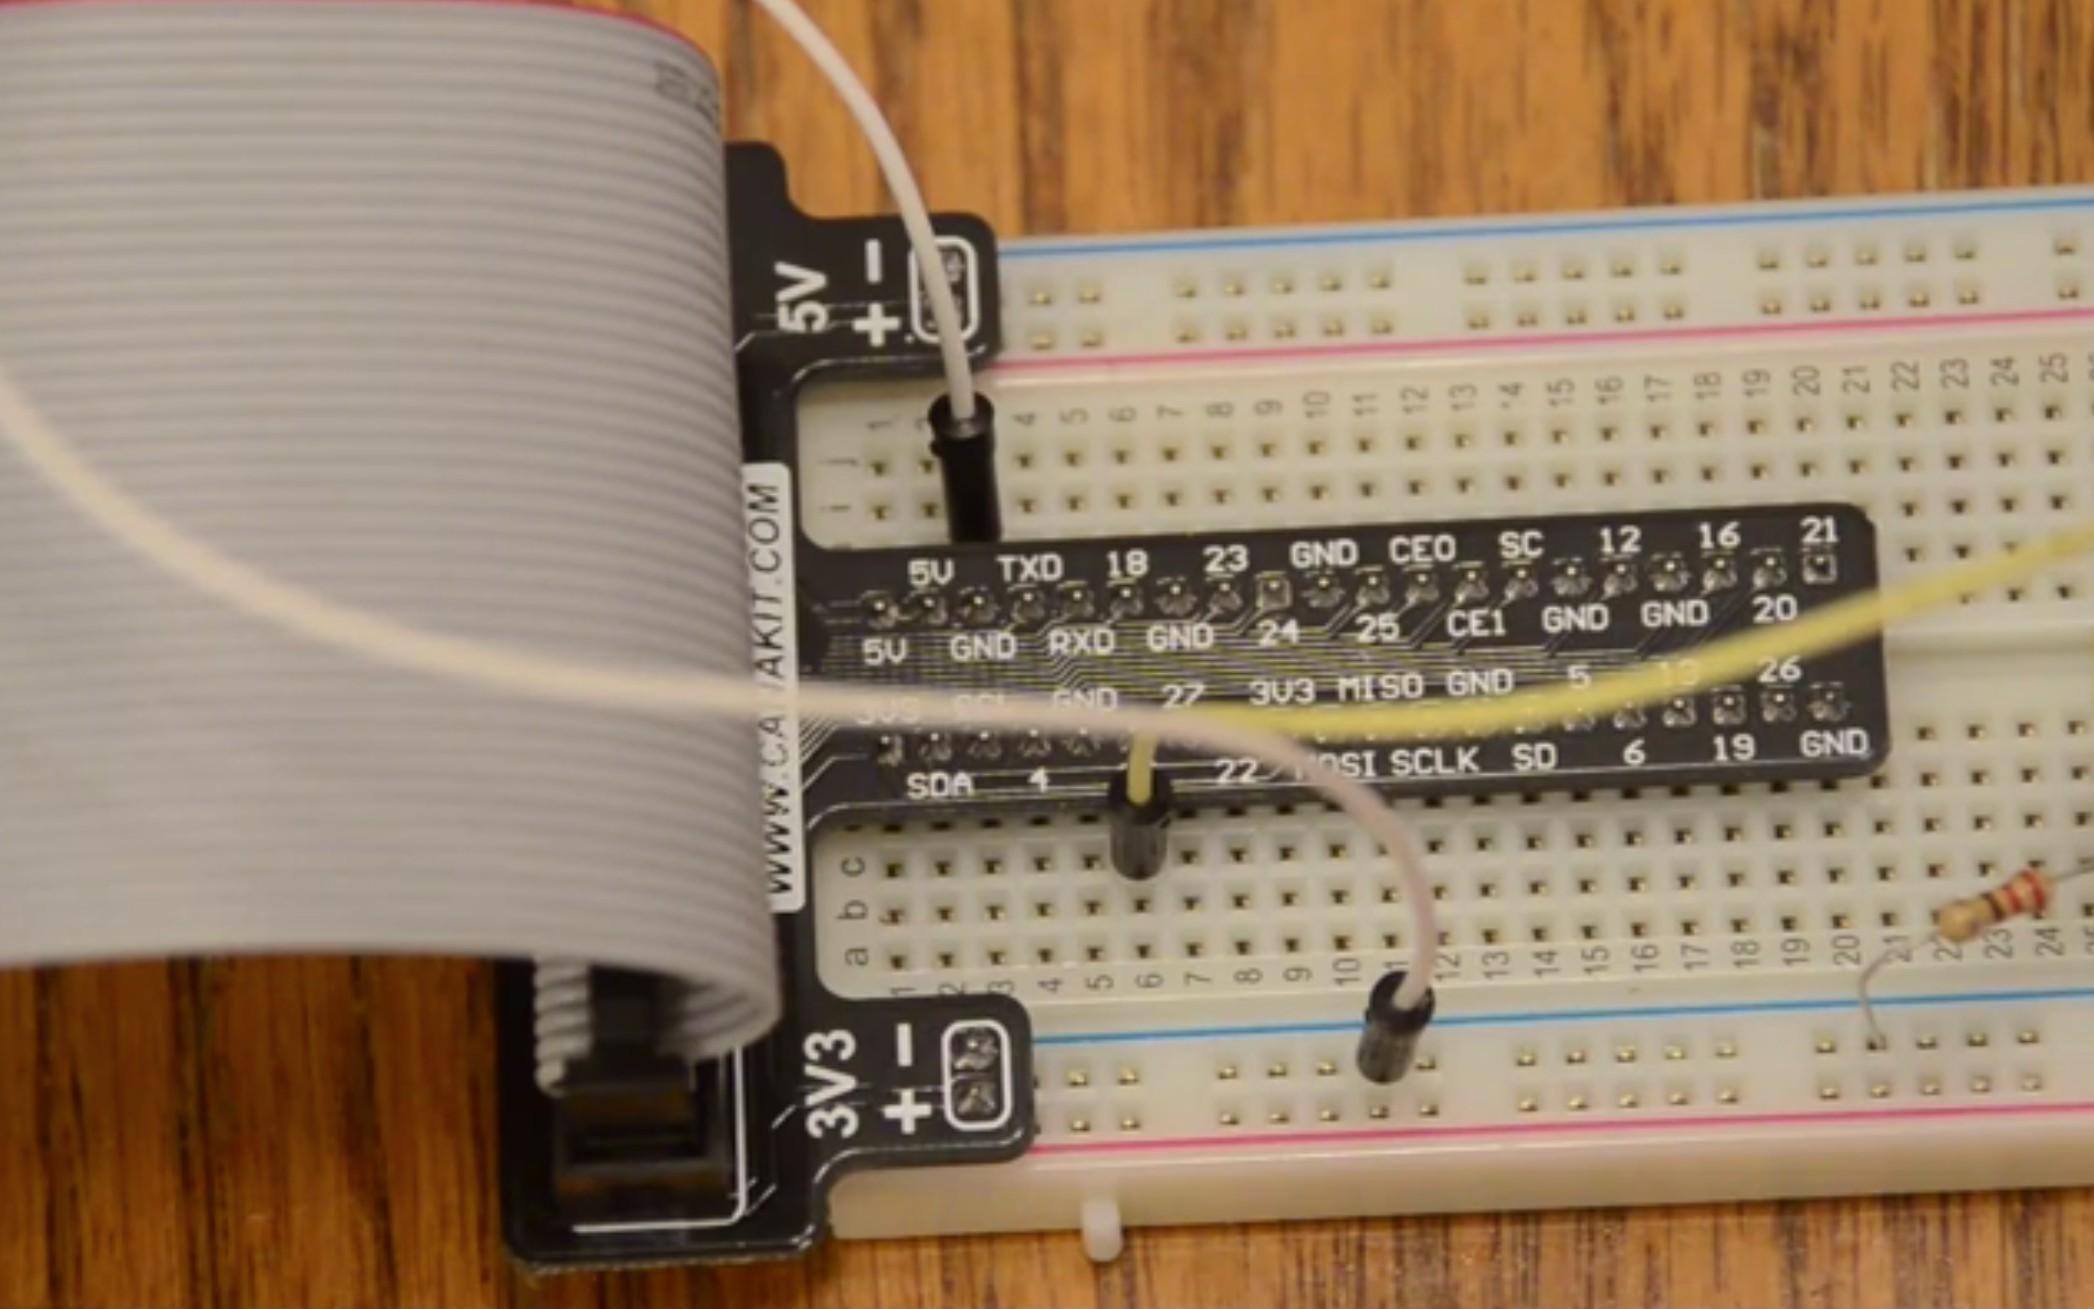 Iot Python App With A Raspberry Pi And Bluemix Dzone Wiringpi Not Working